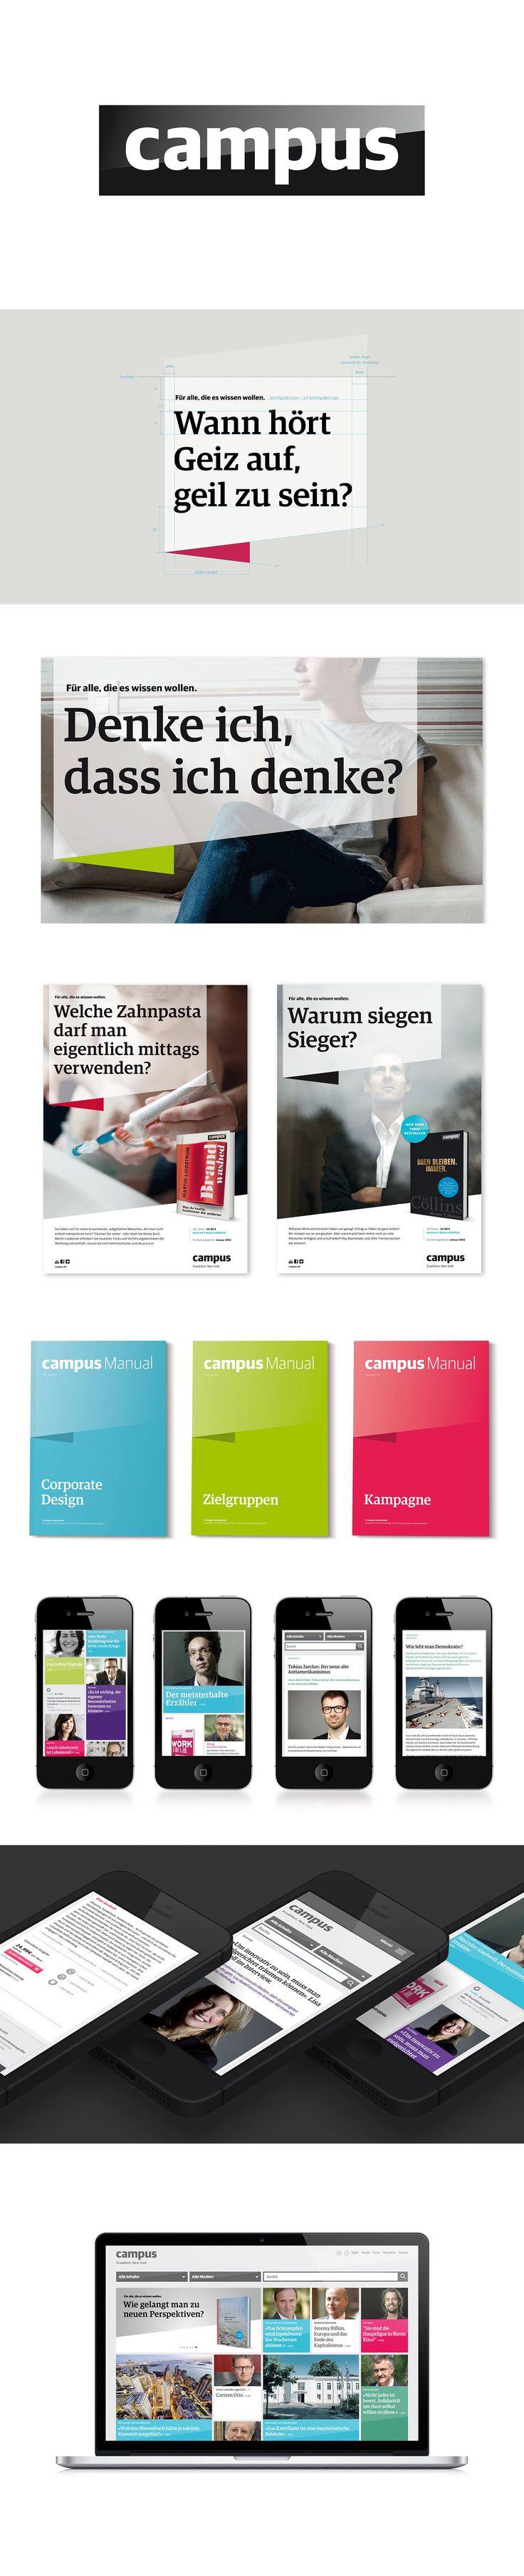 Pinned from https://pinterest.com/rothenhaeusler/best-of-corporate-design/ · Client: Campus Verlag · Agency: hauser lacour (Frankfurt) #branding #identity #corporatedesign